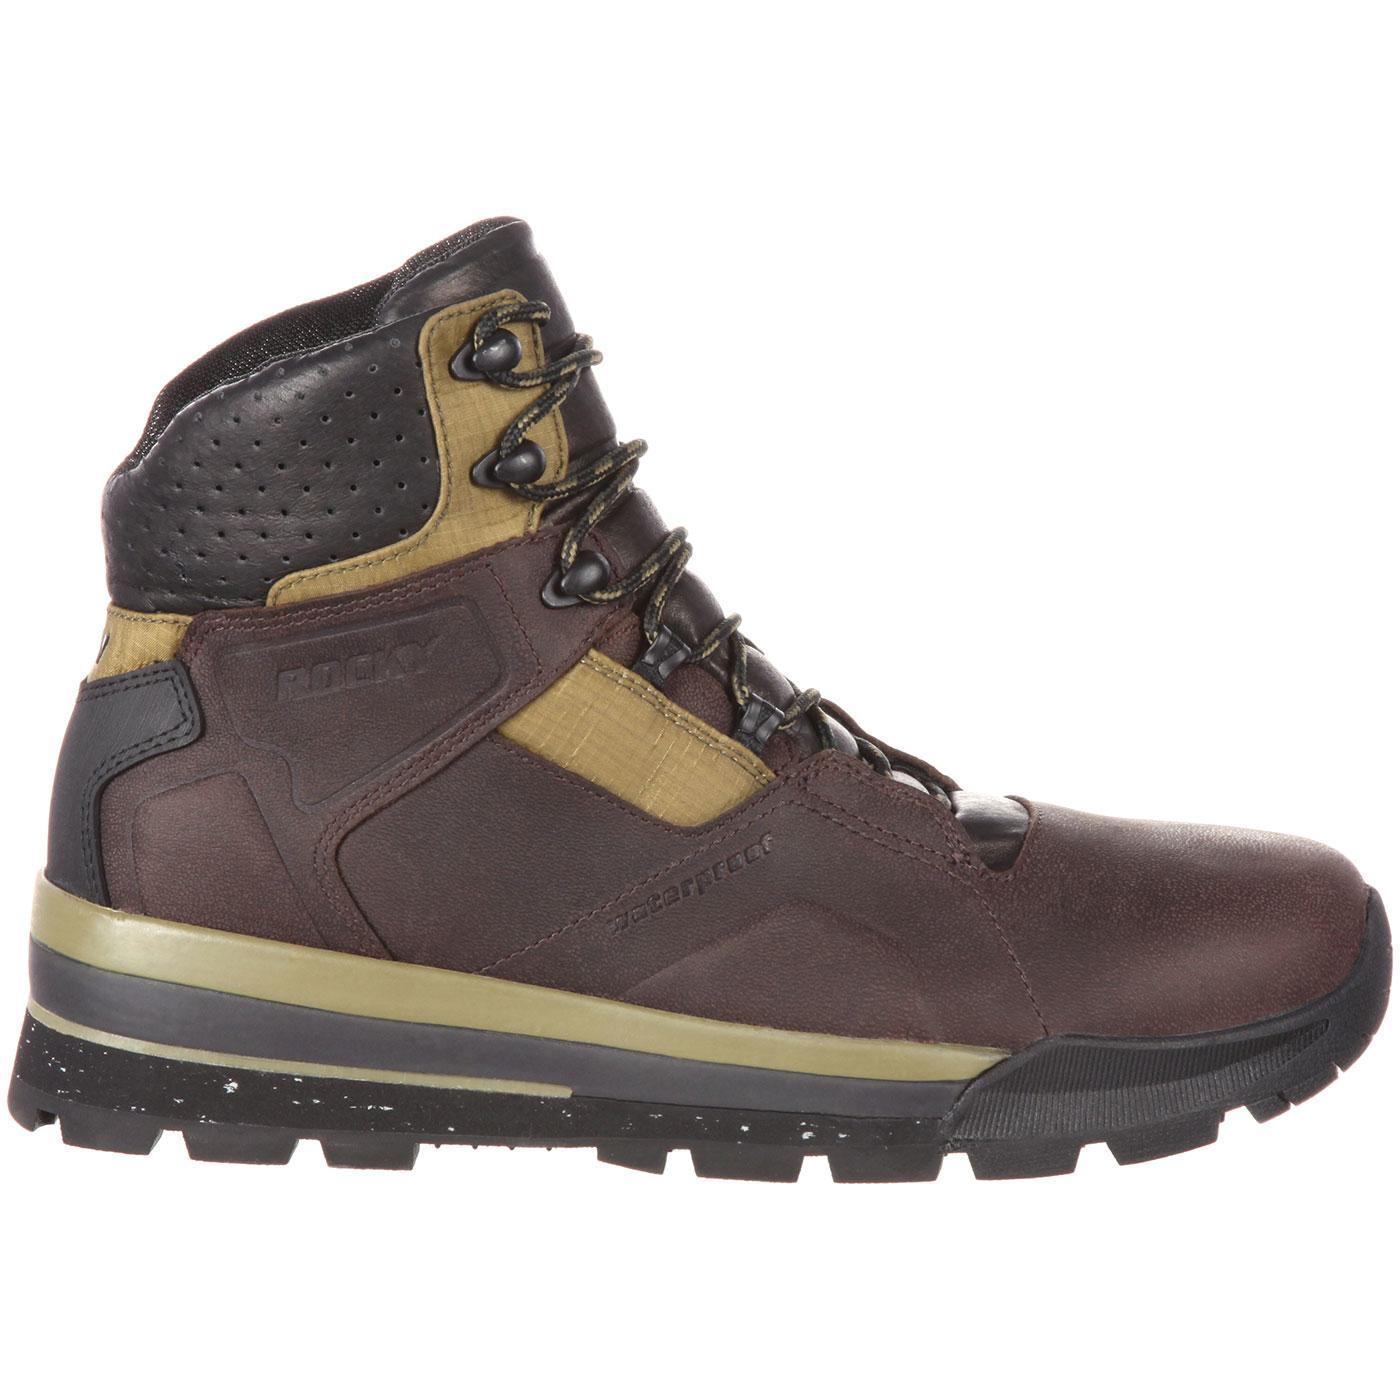 Rocky S2v Extreme Men S Waterproof Brown Green Hiker Rke0035